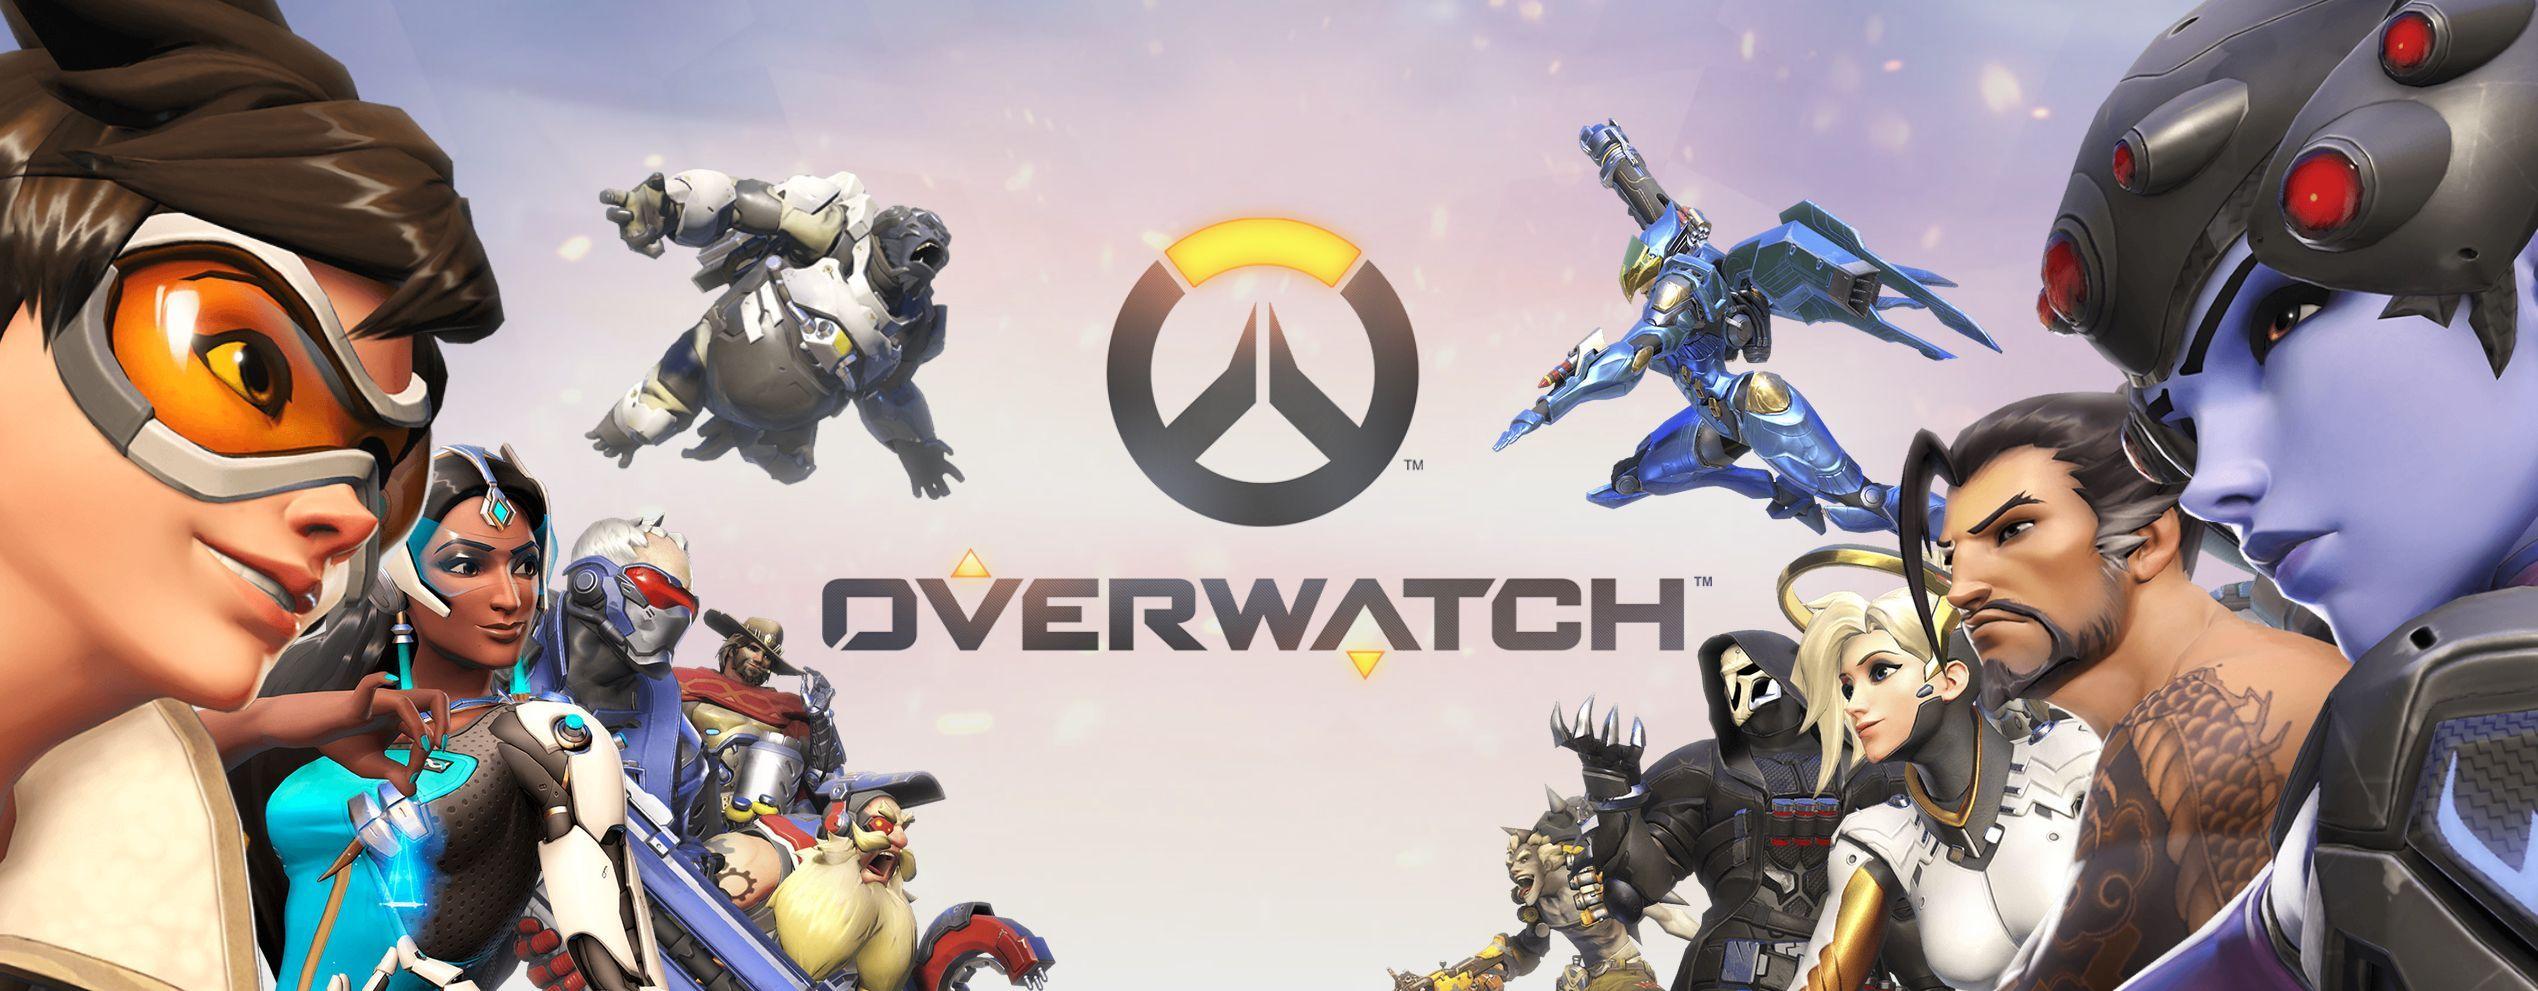 Overwatch Angebote